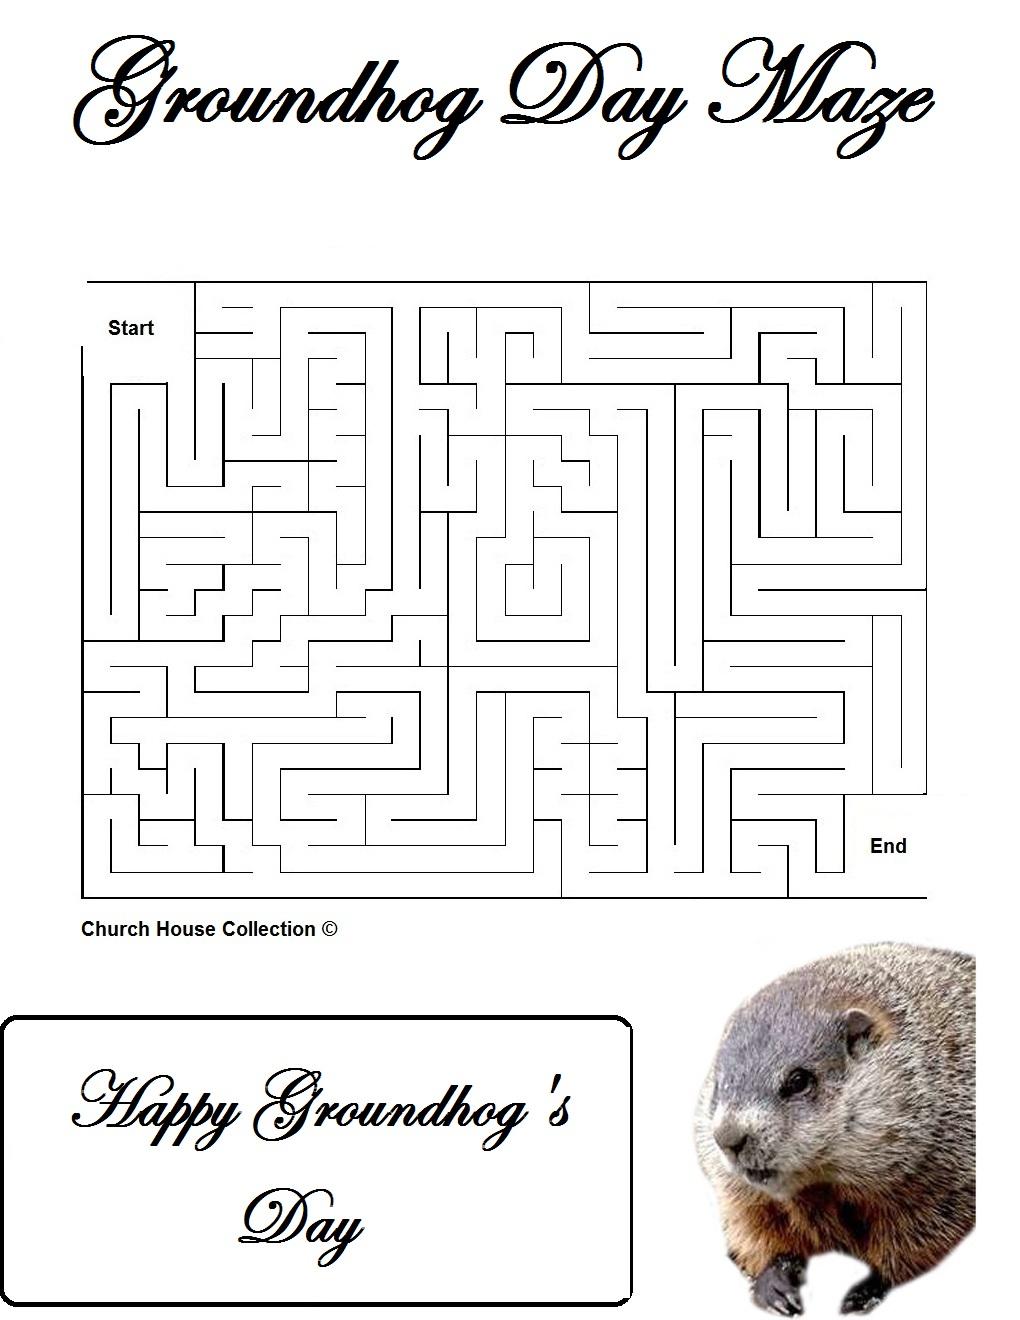 Uncategorized Groundhog Day Math Worksheets church house collection blog groundhog day mazes for school teachers teachers